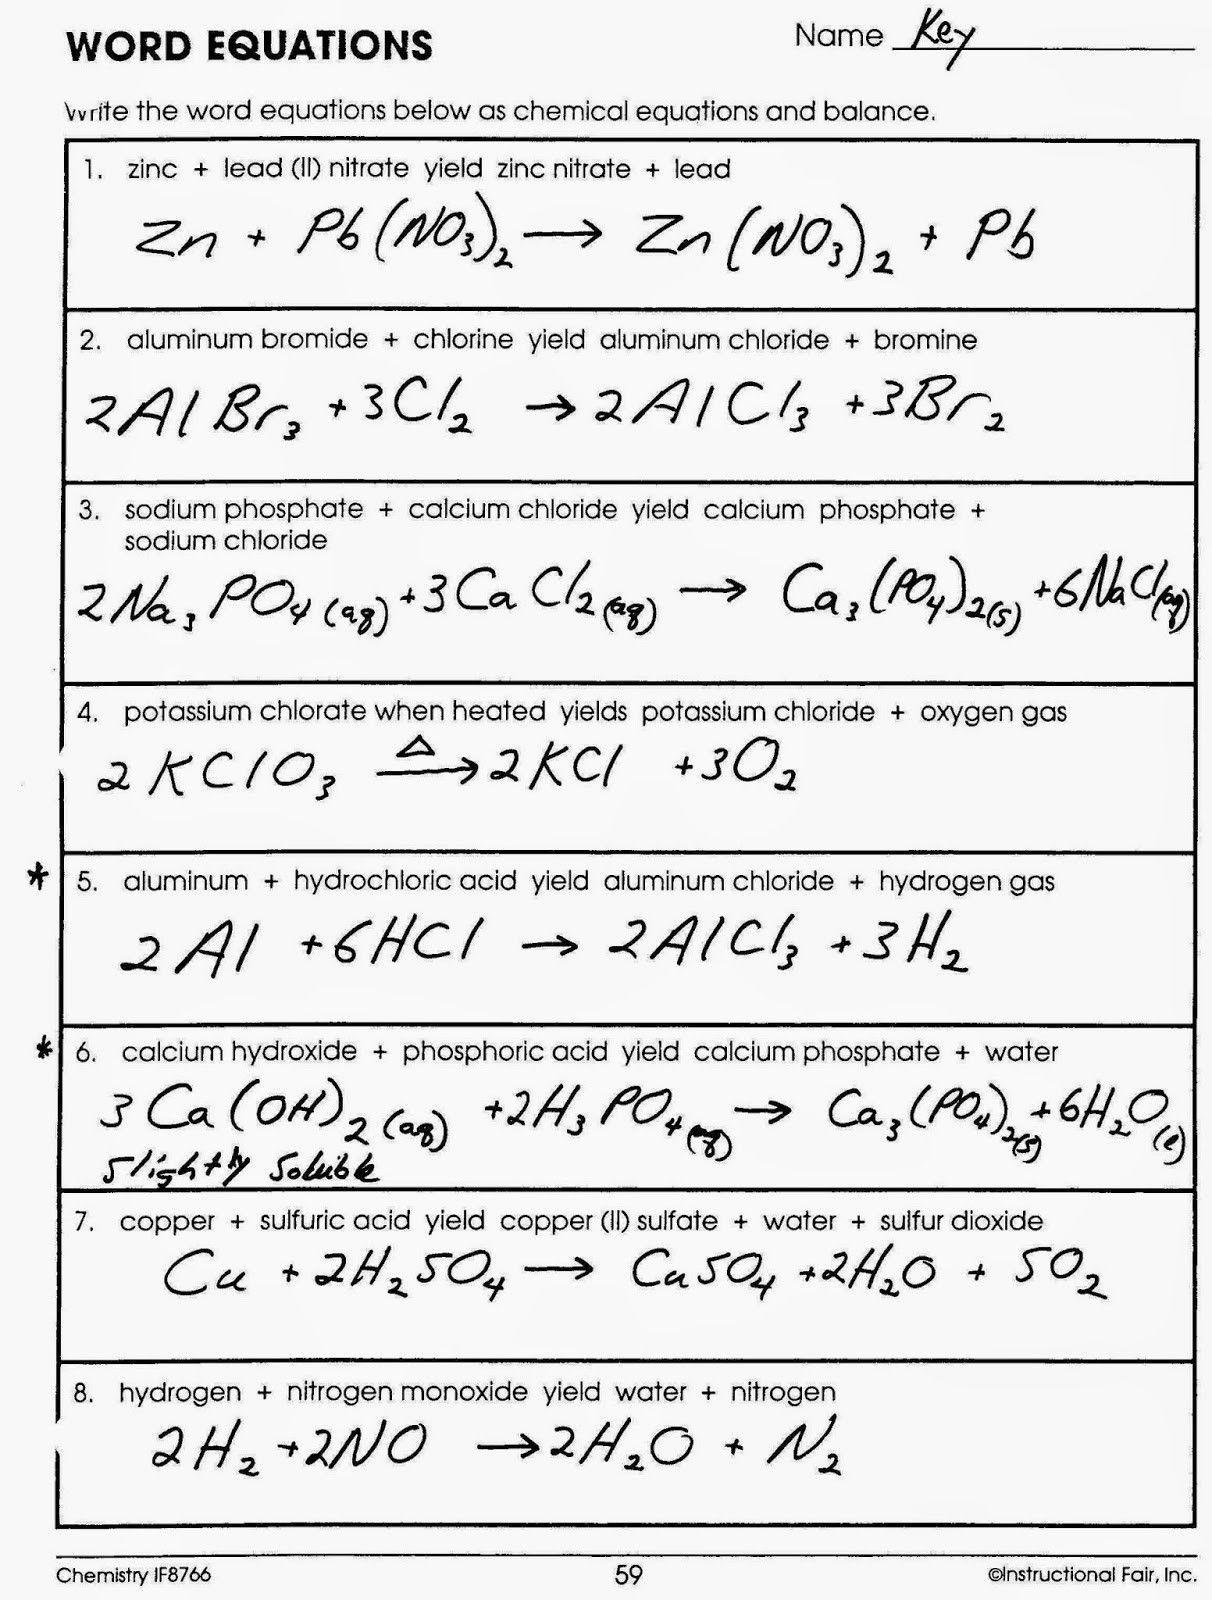 Word Equations Chemistry Worksheet